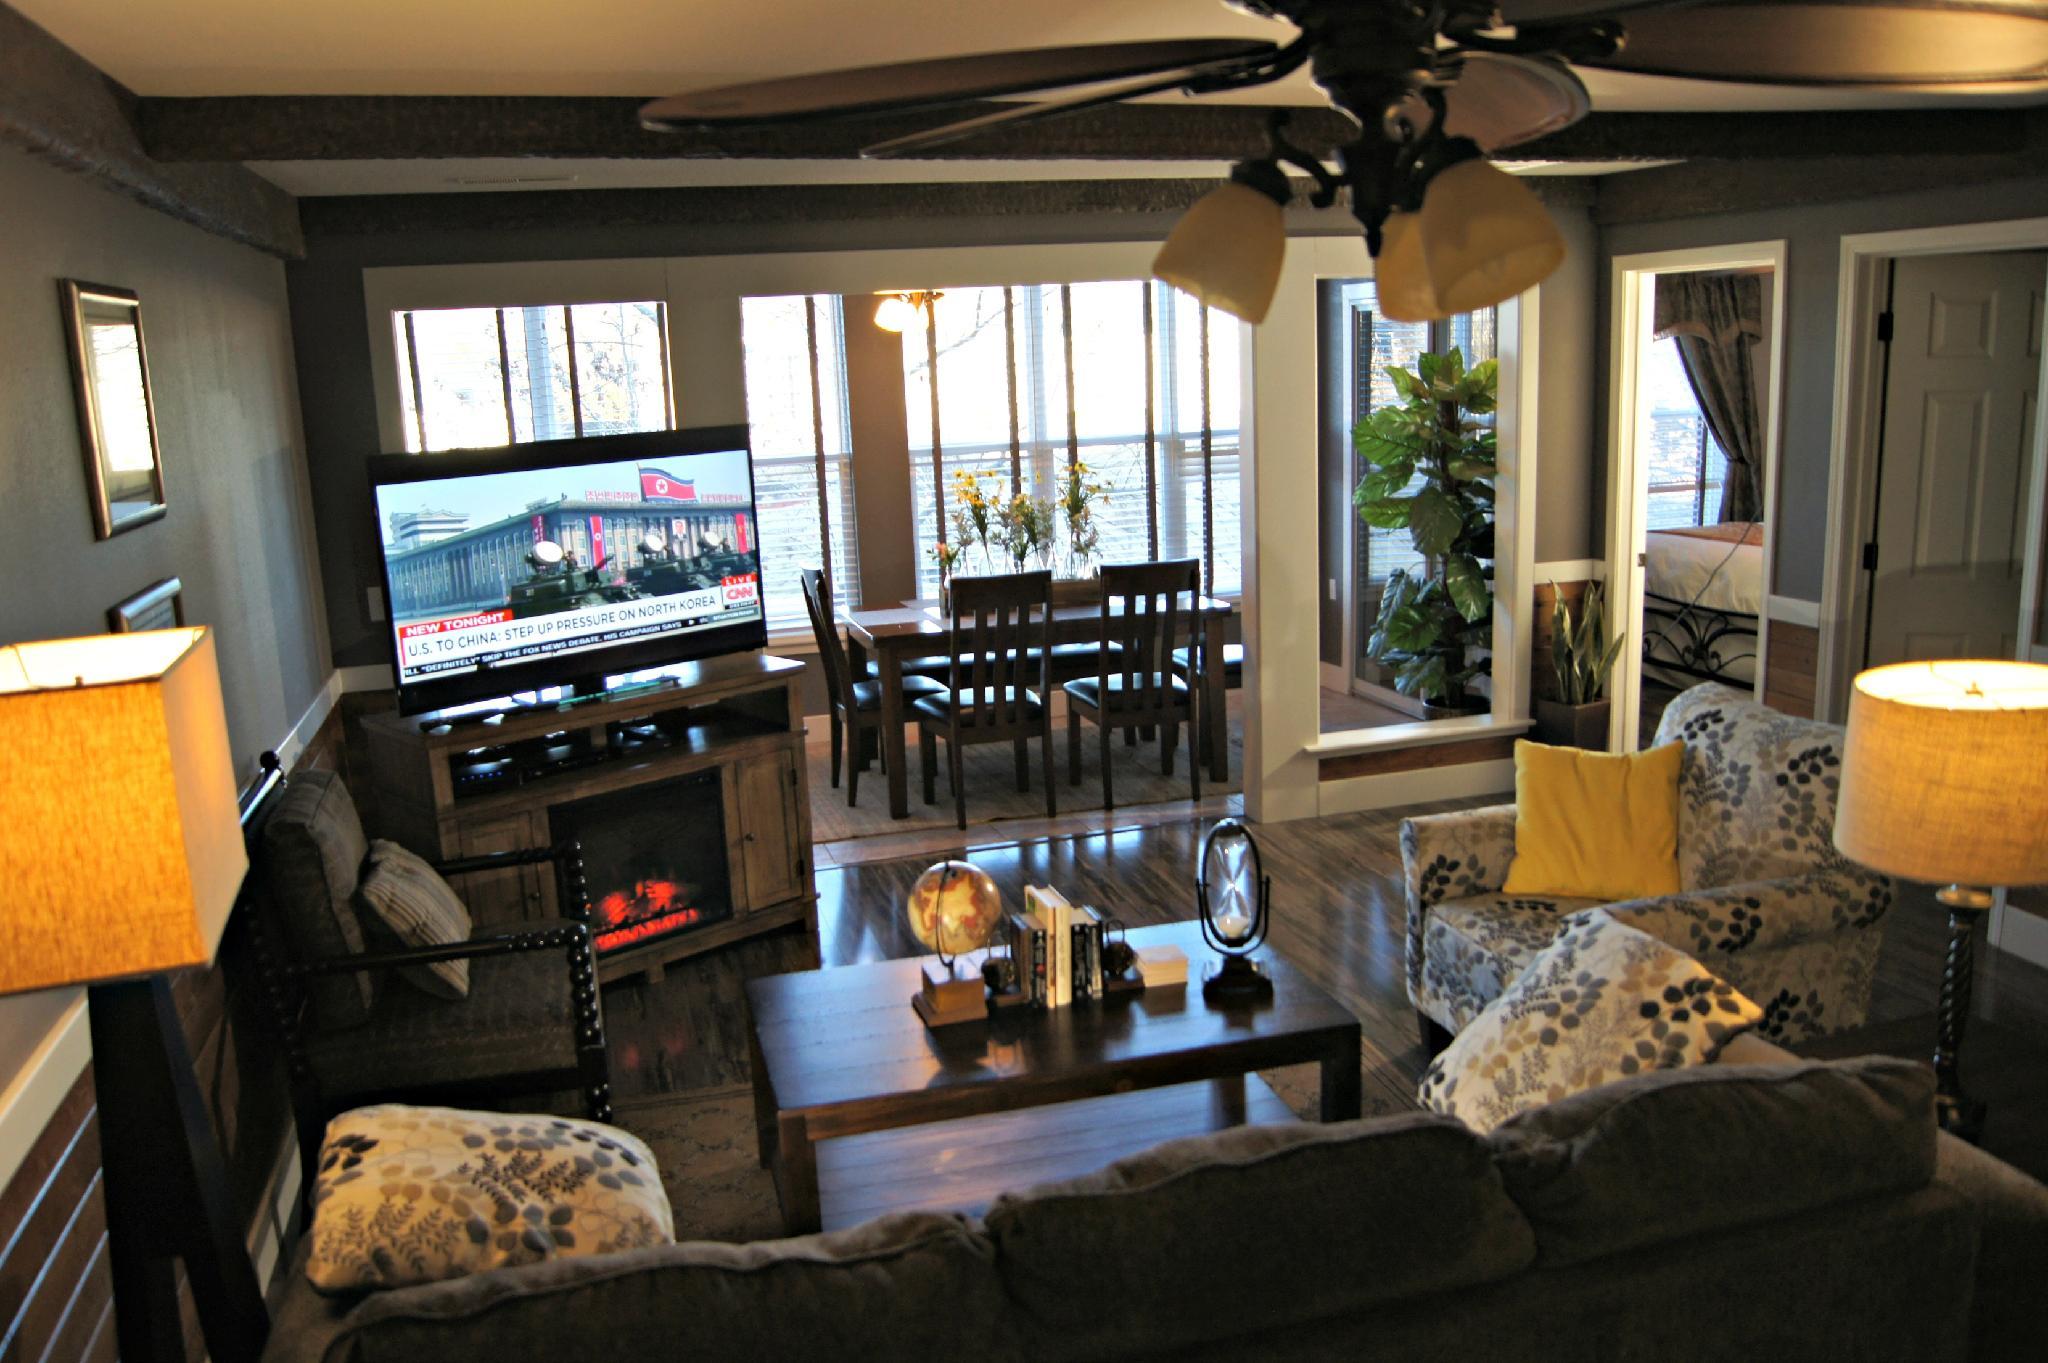 2 Bedroom Walk In Condo, Near the Strip, 1000 Hills Golf View, Sleeps 8: Club A-8